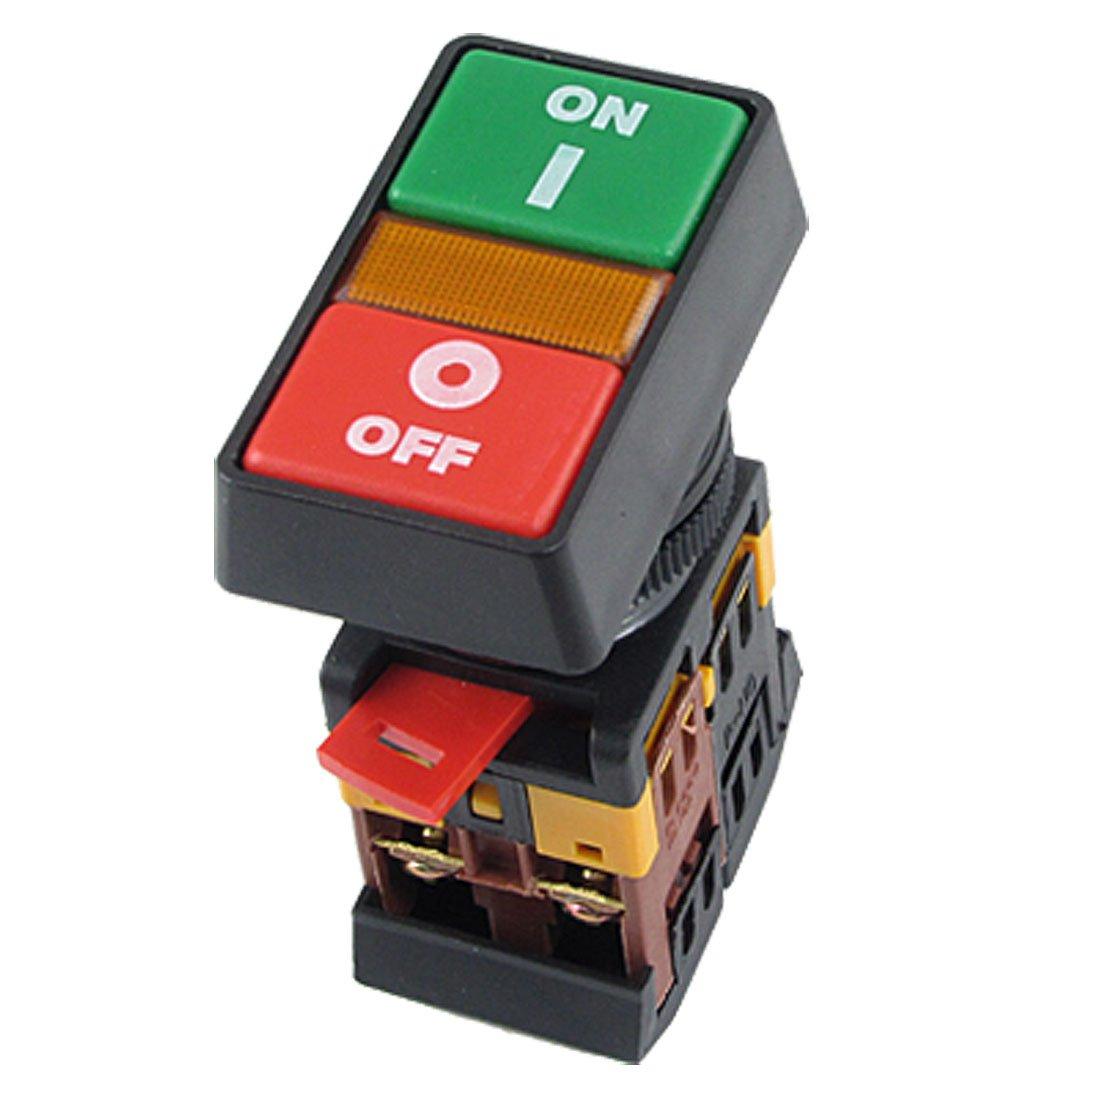 все цены на  Promotion! ON OFF START STOP Push Button w Light Indicator Momentary Switch Red Green Power  онлайн